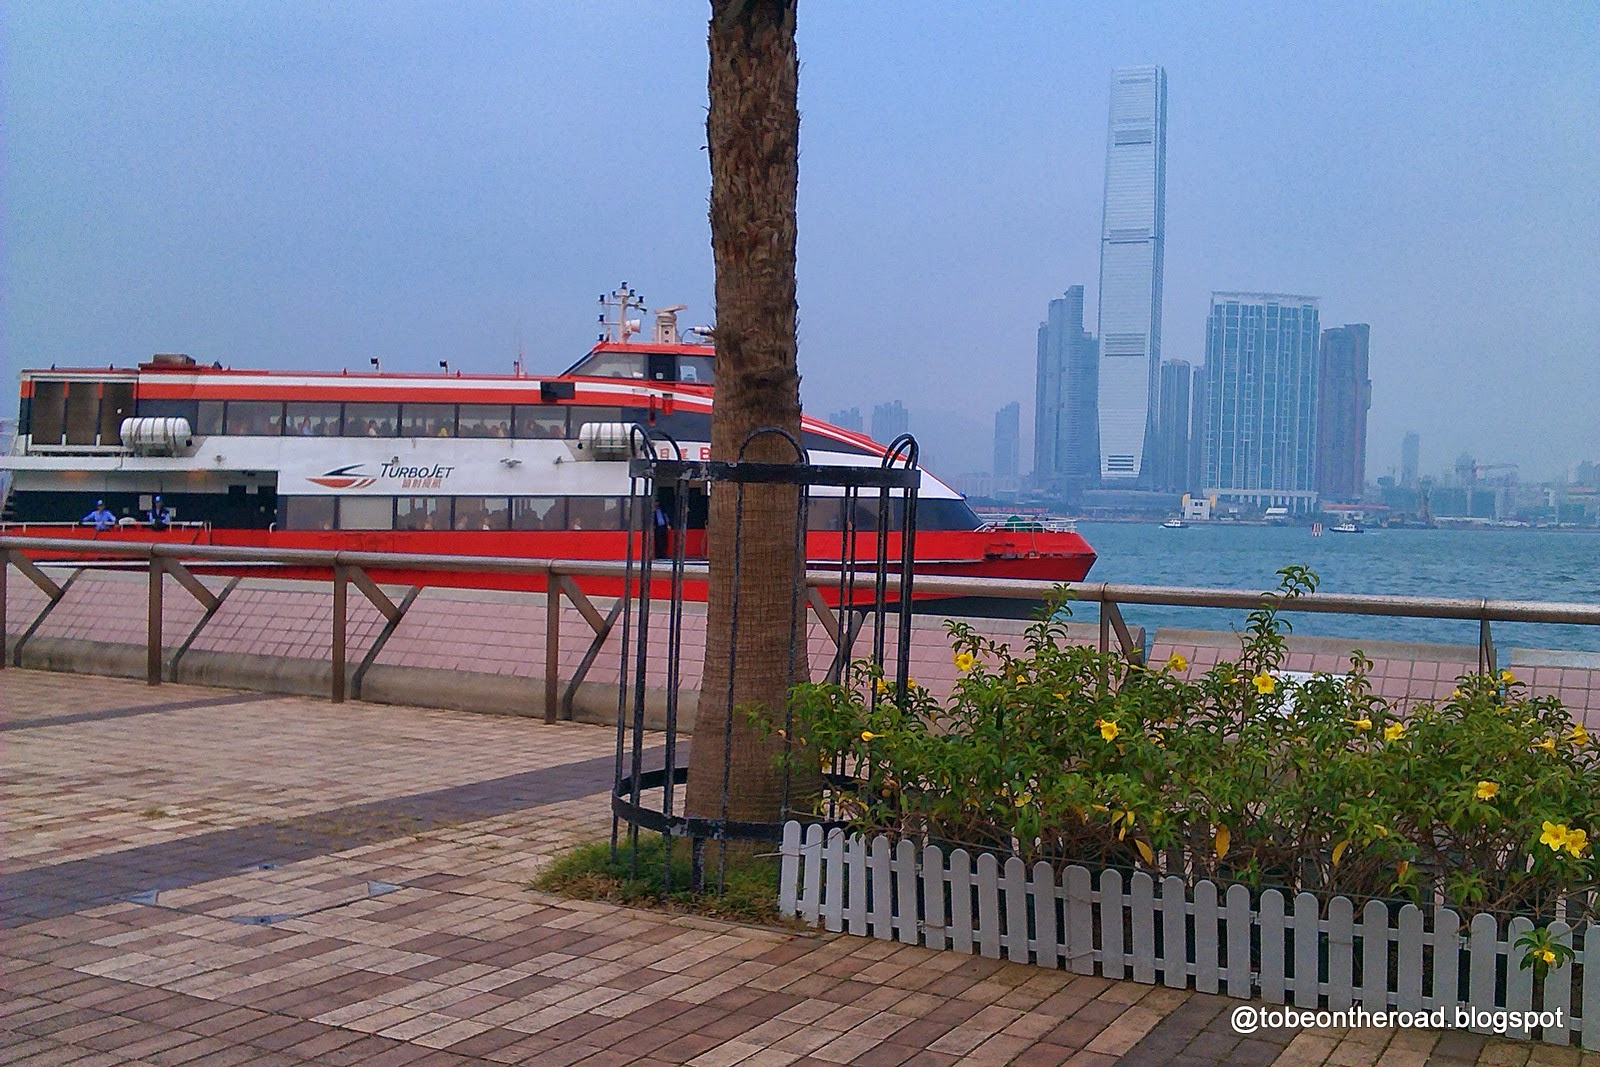 Hongkong,Ferry,Macau,Avenue of stars,Victoria